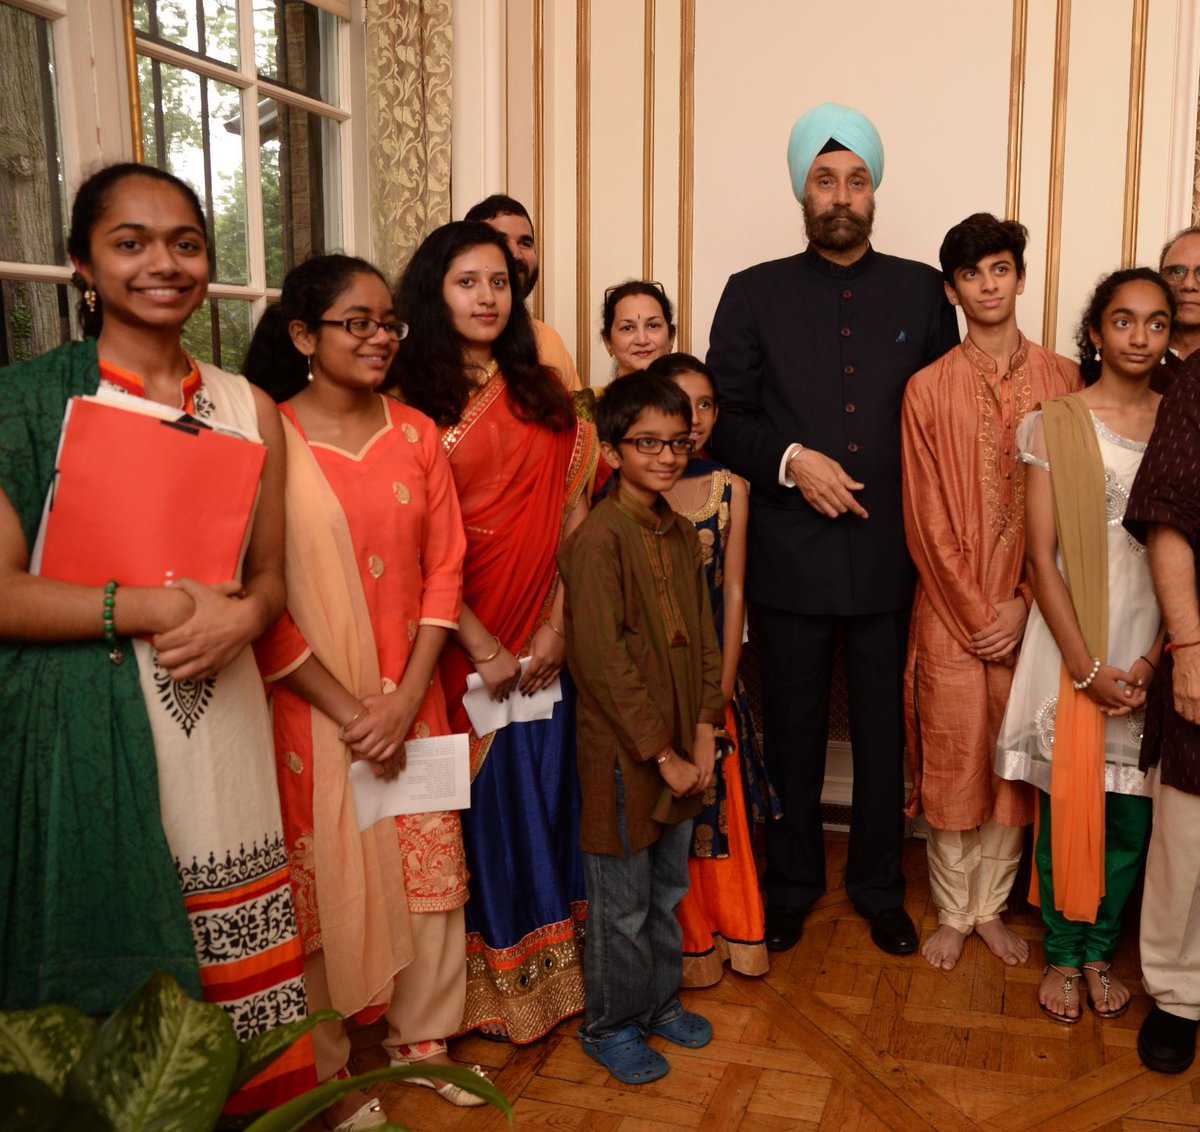 Indian Ambassador to the US Navtej Sarna celebrates Independence day with Indian diaspora in US.